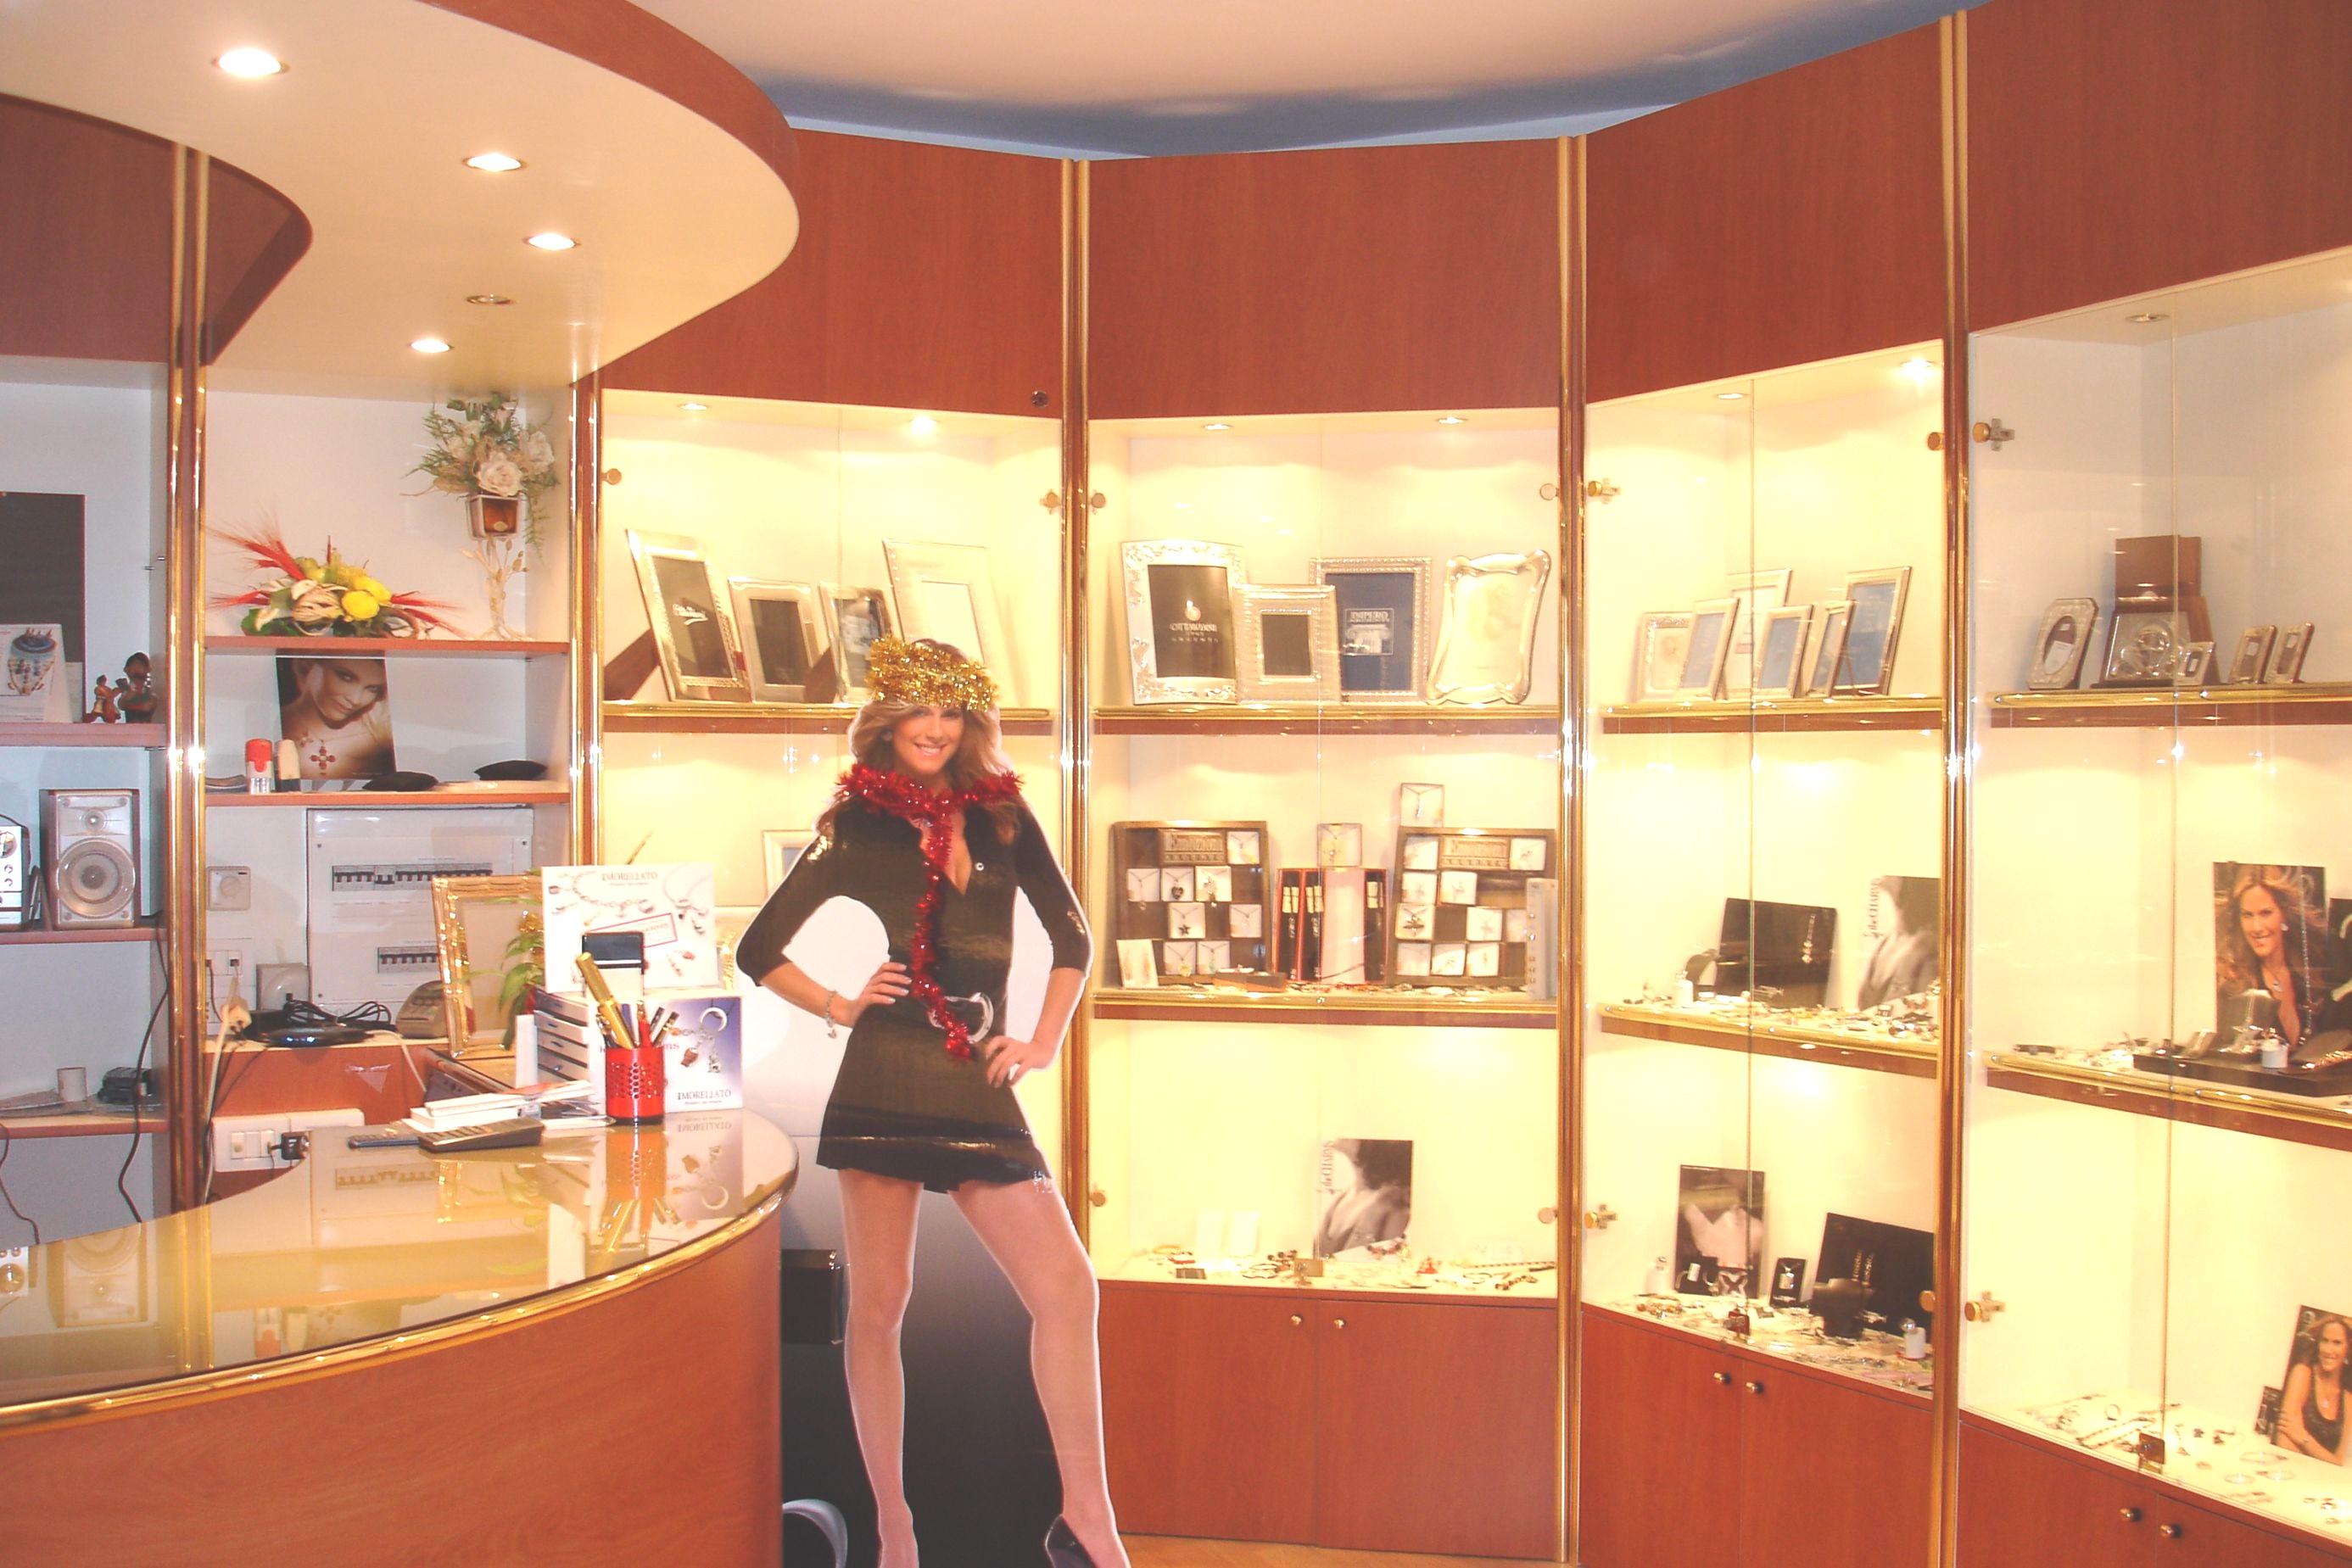 Arredamenti per gioiellerie compra in fabbrica a met for Arredamento rustico ikea